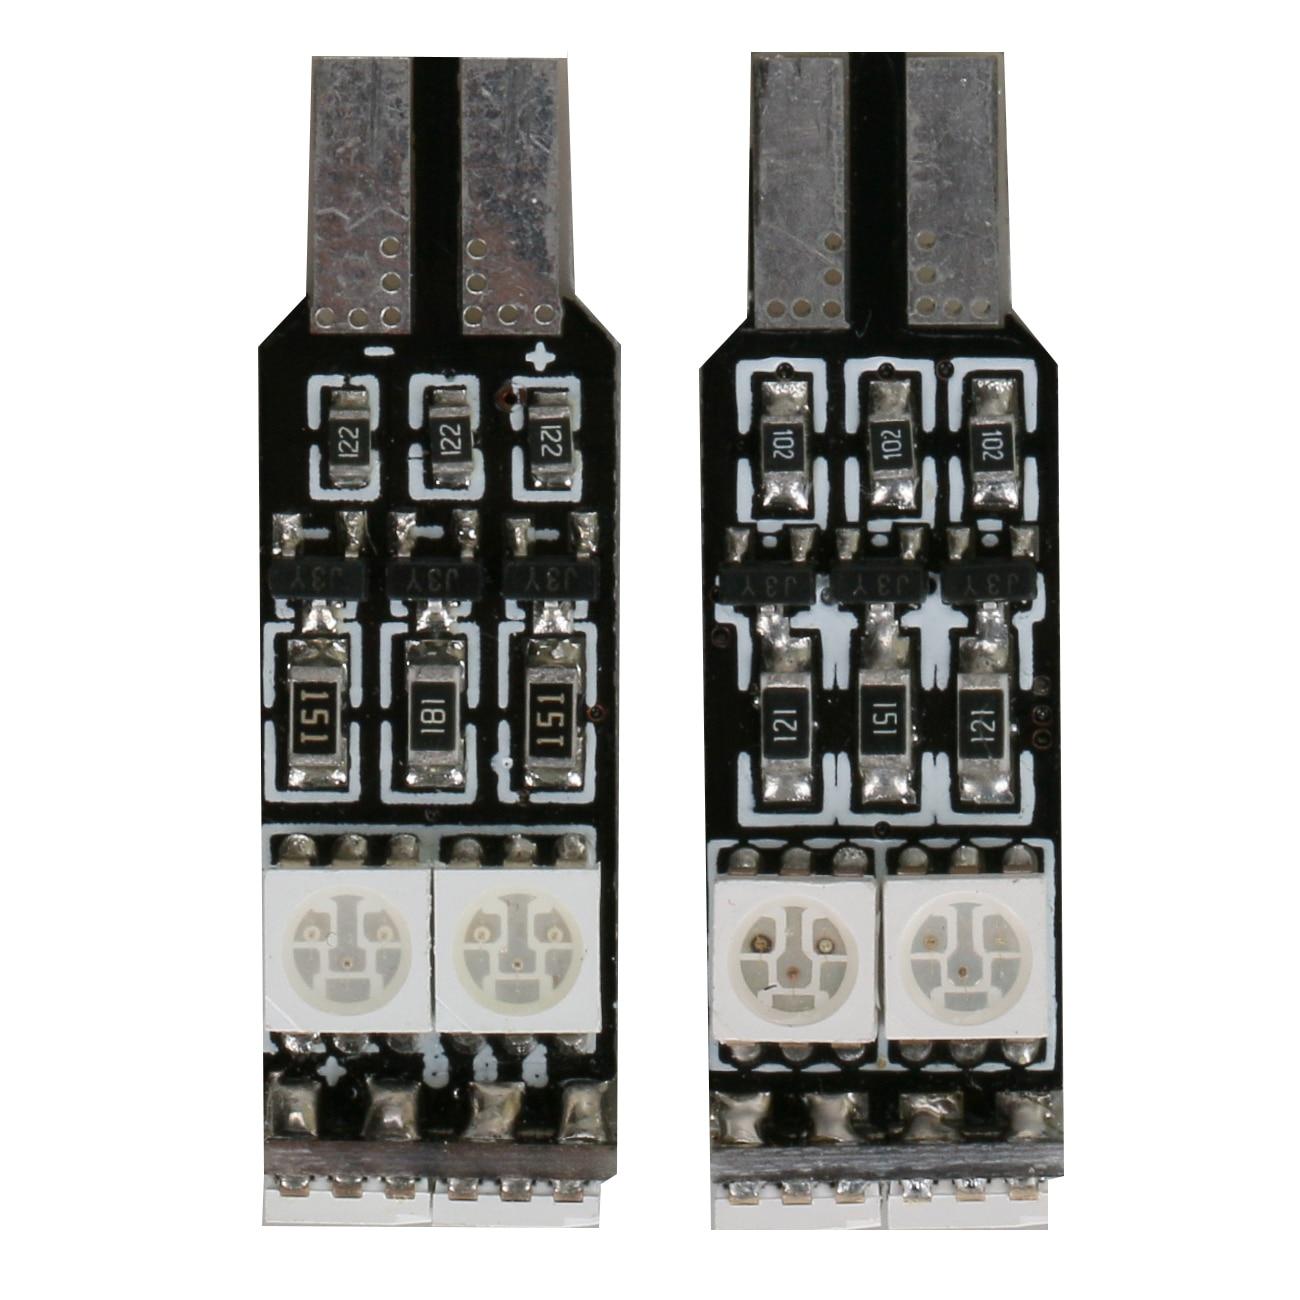 5050 T10 6-SMD LED Bulbs High Power, LED Car Interior,Dashboard Number Plate,Boot Light Lamp 12V